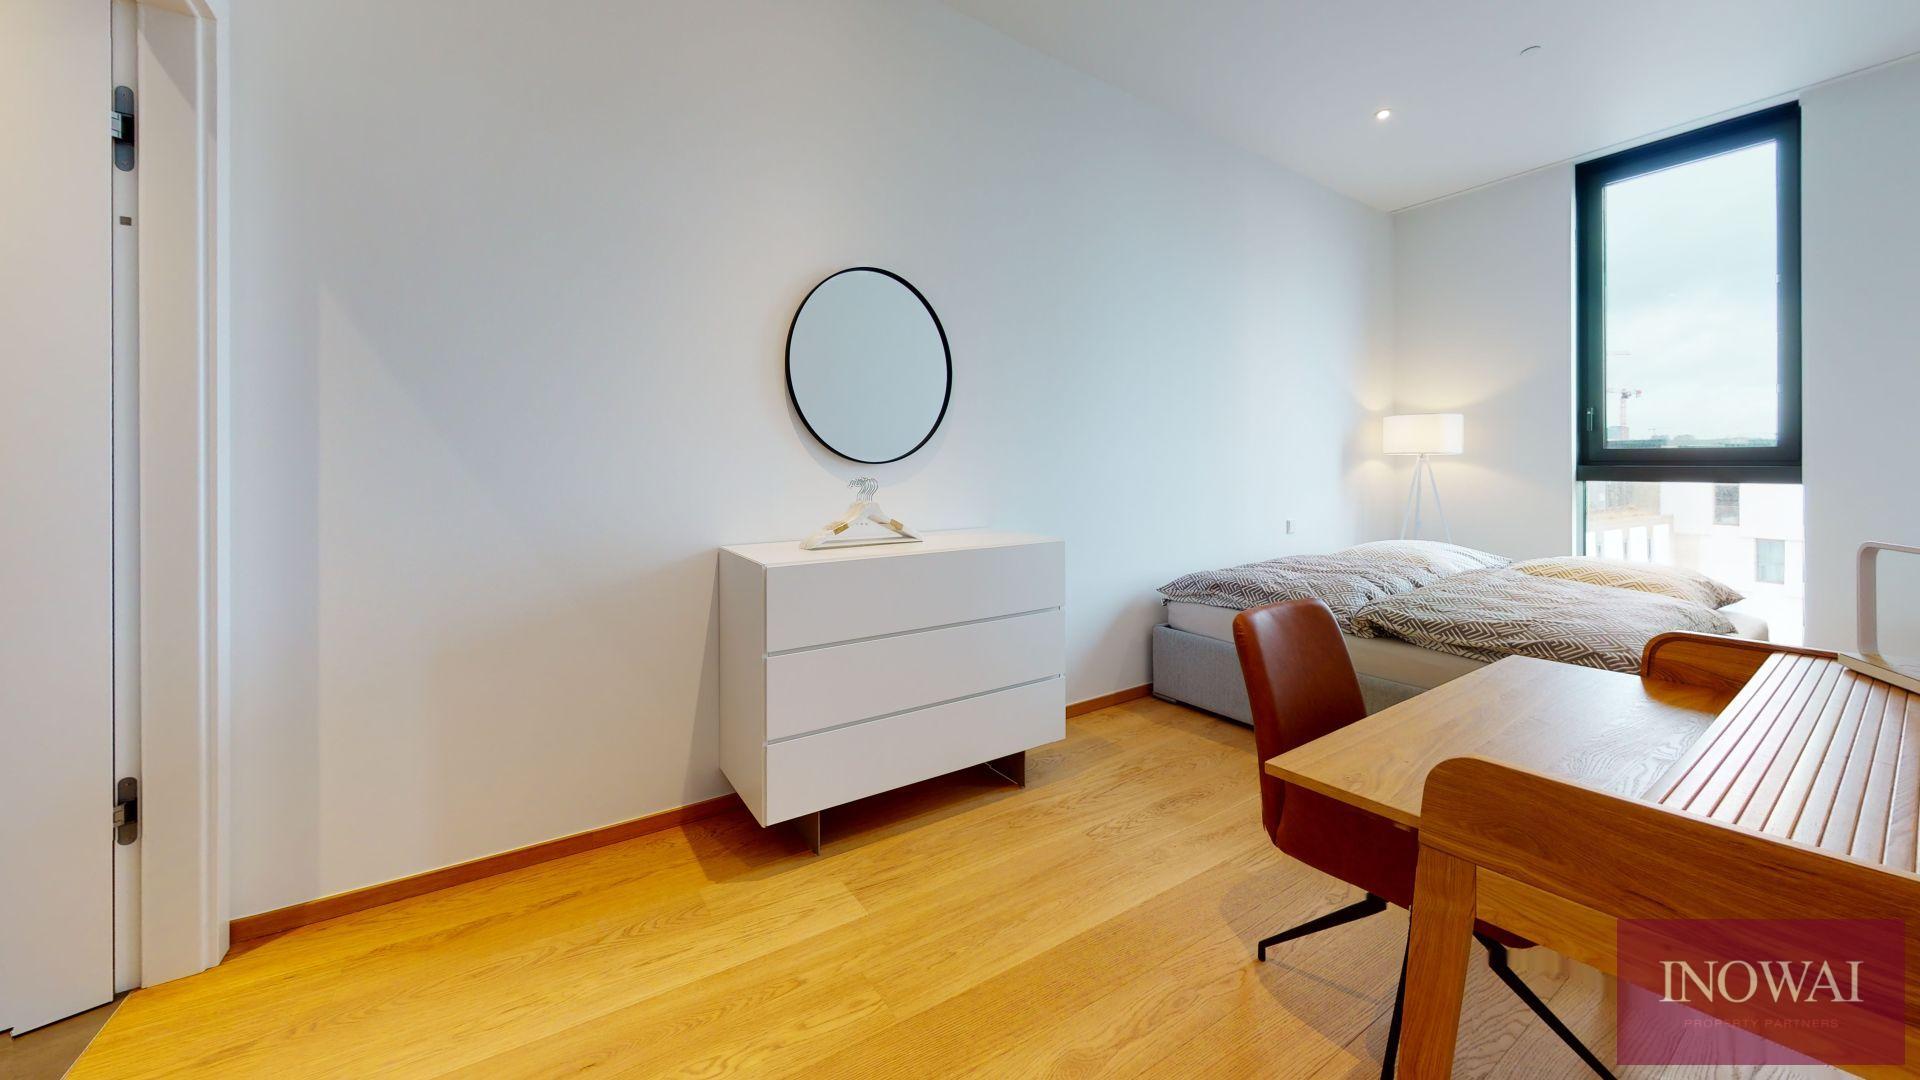 Appartement 1 chambre meublé